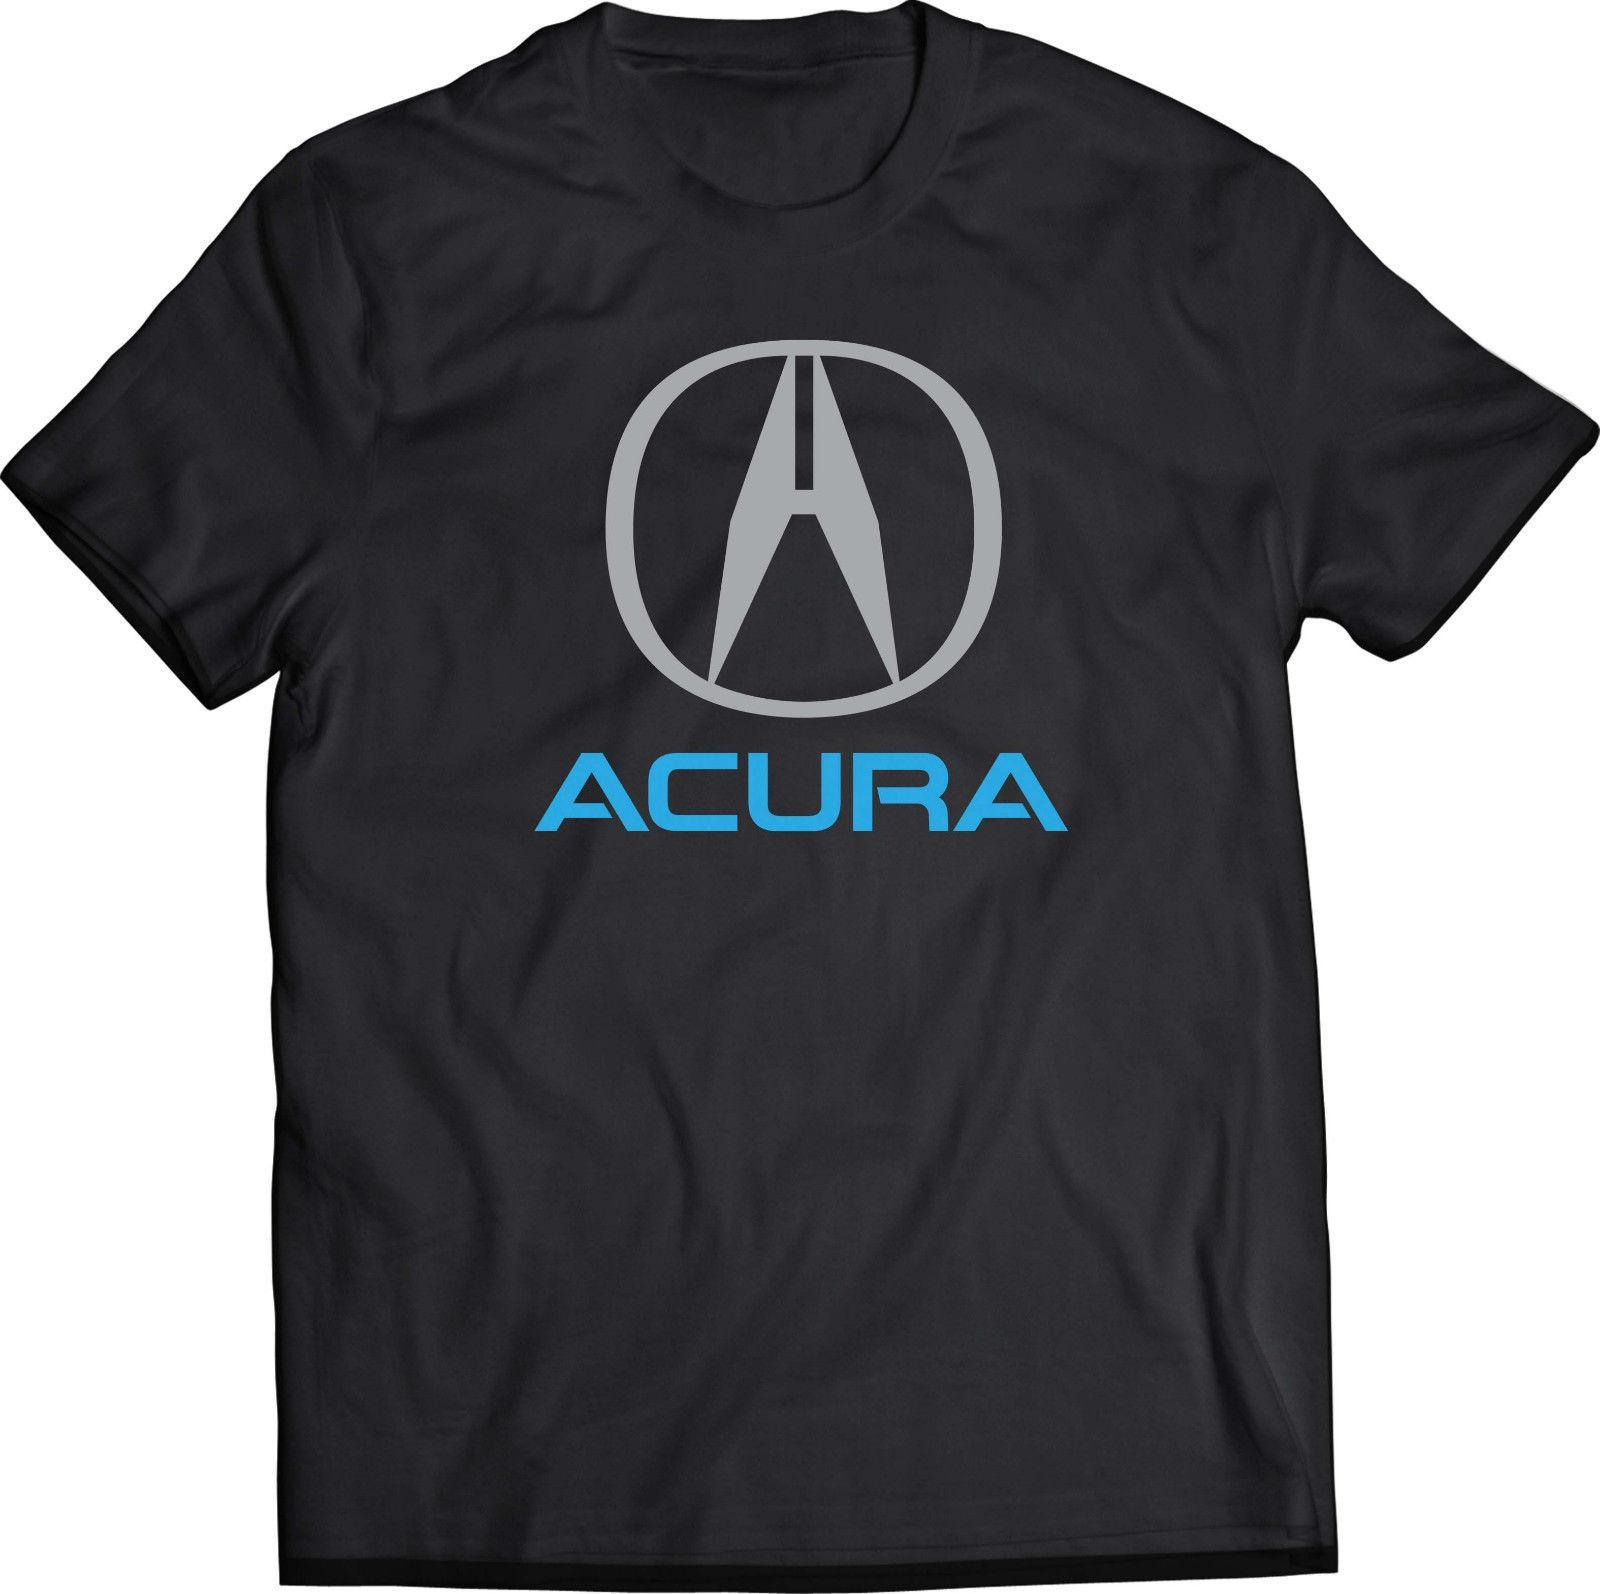 Acura Sport Car Black T Shirt T Shirt Design Online Vintage Tees - Acura clothing